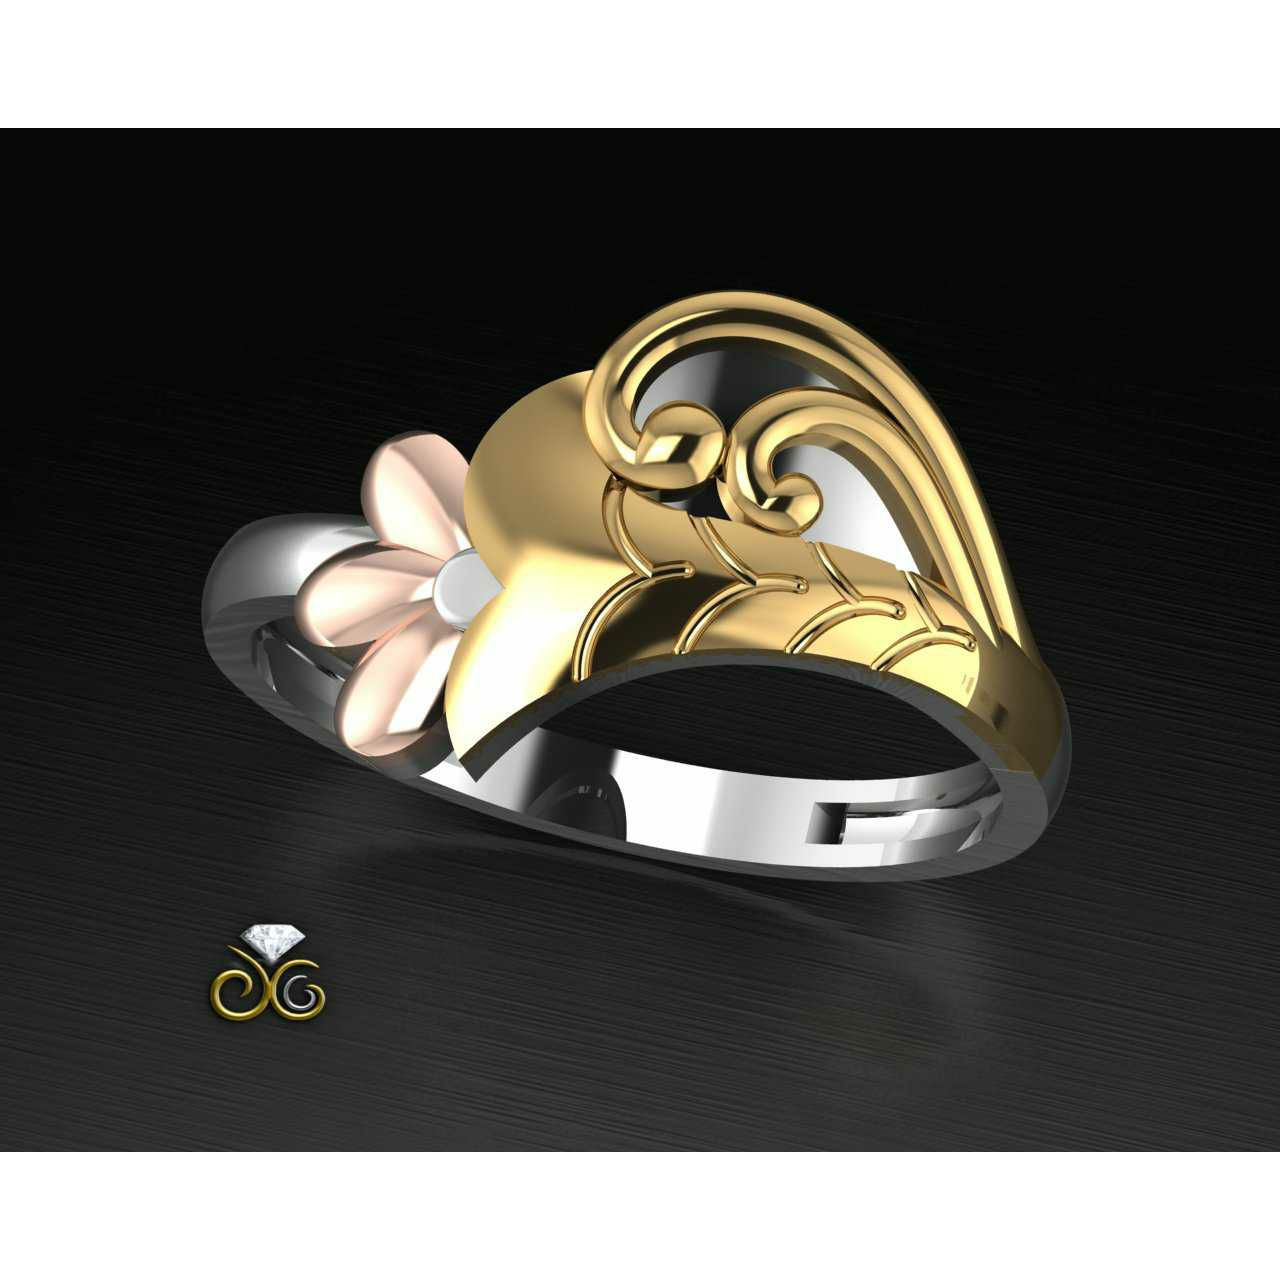 Handmade Toe Ring Bichiya(Vichiya) Ferva Ms-2489